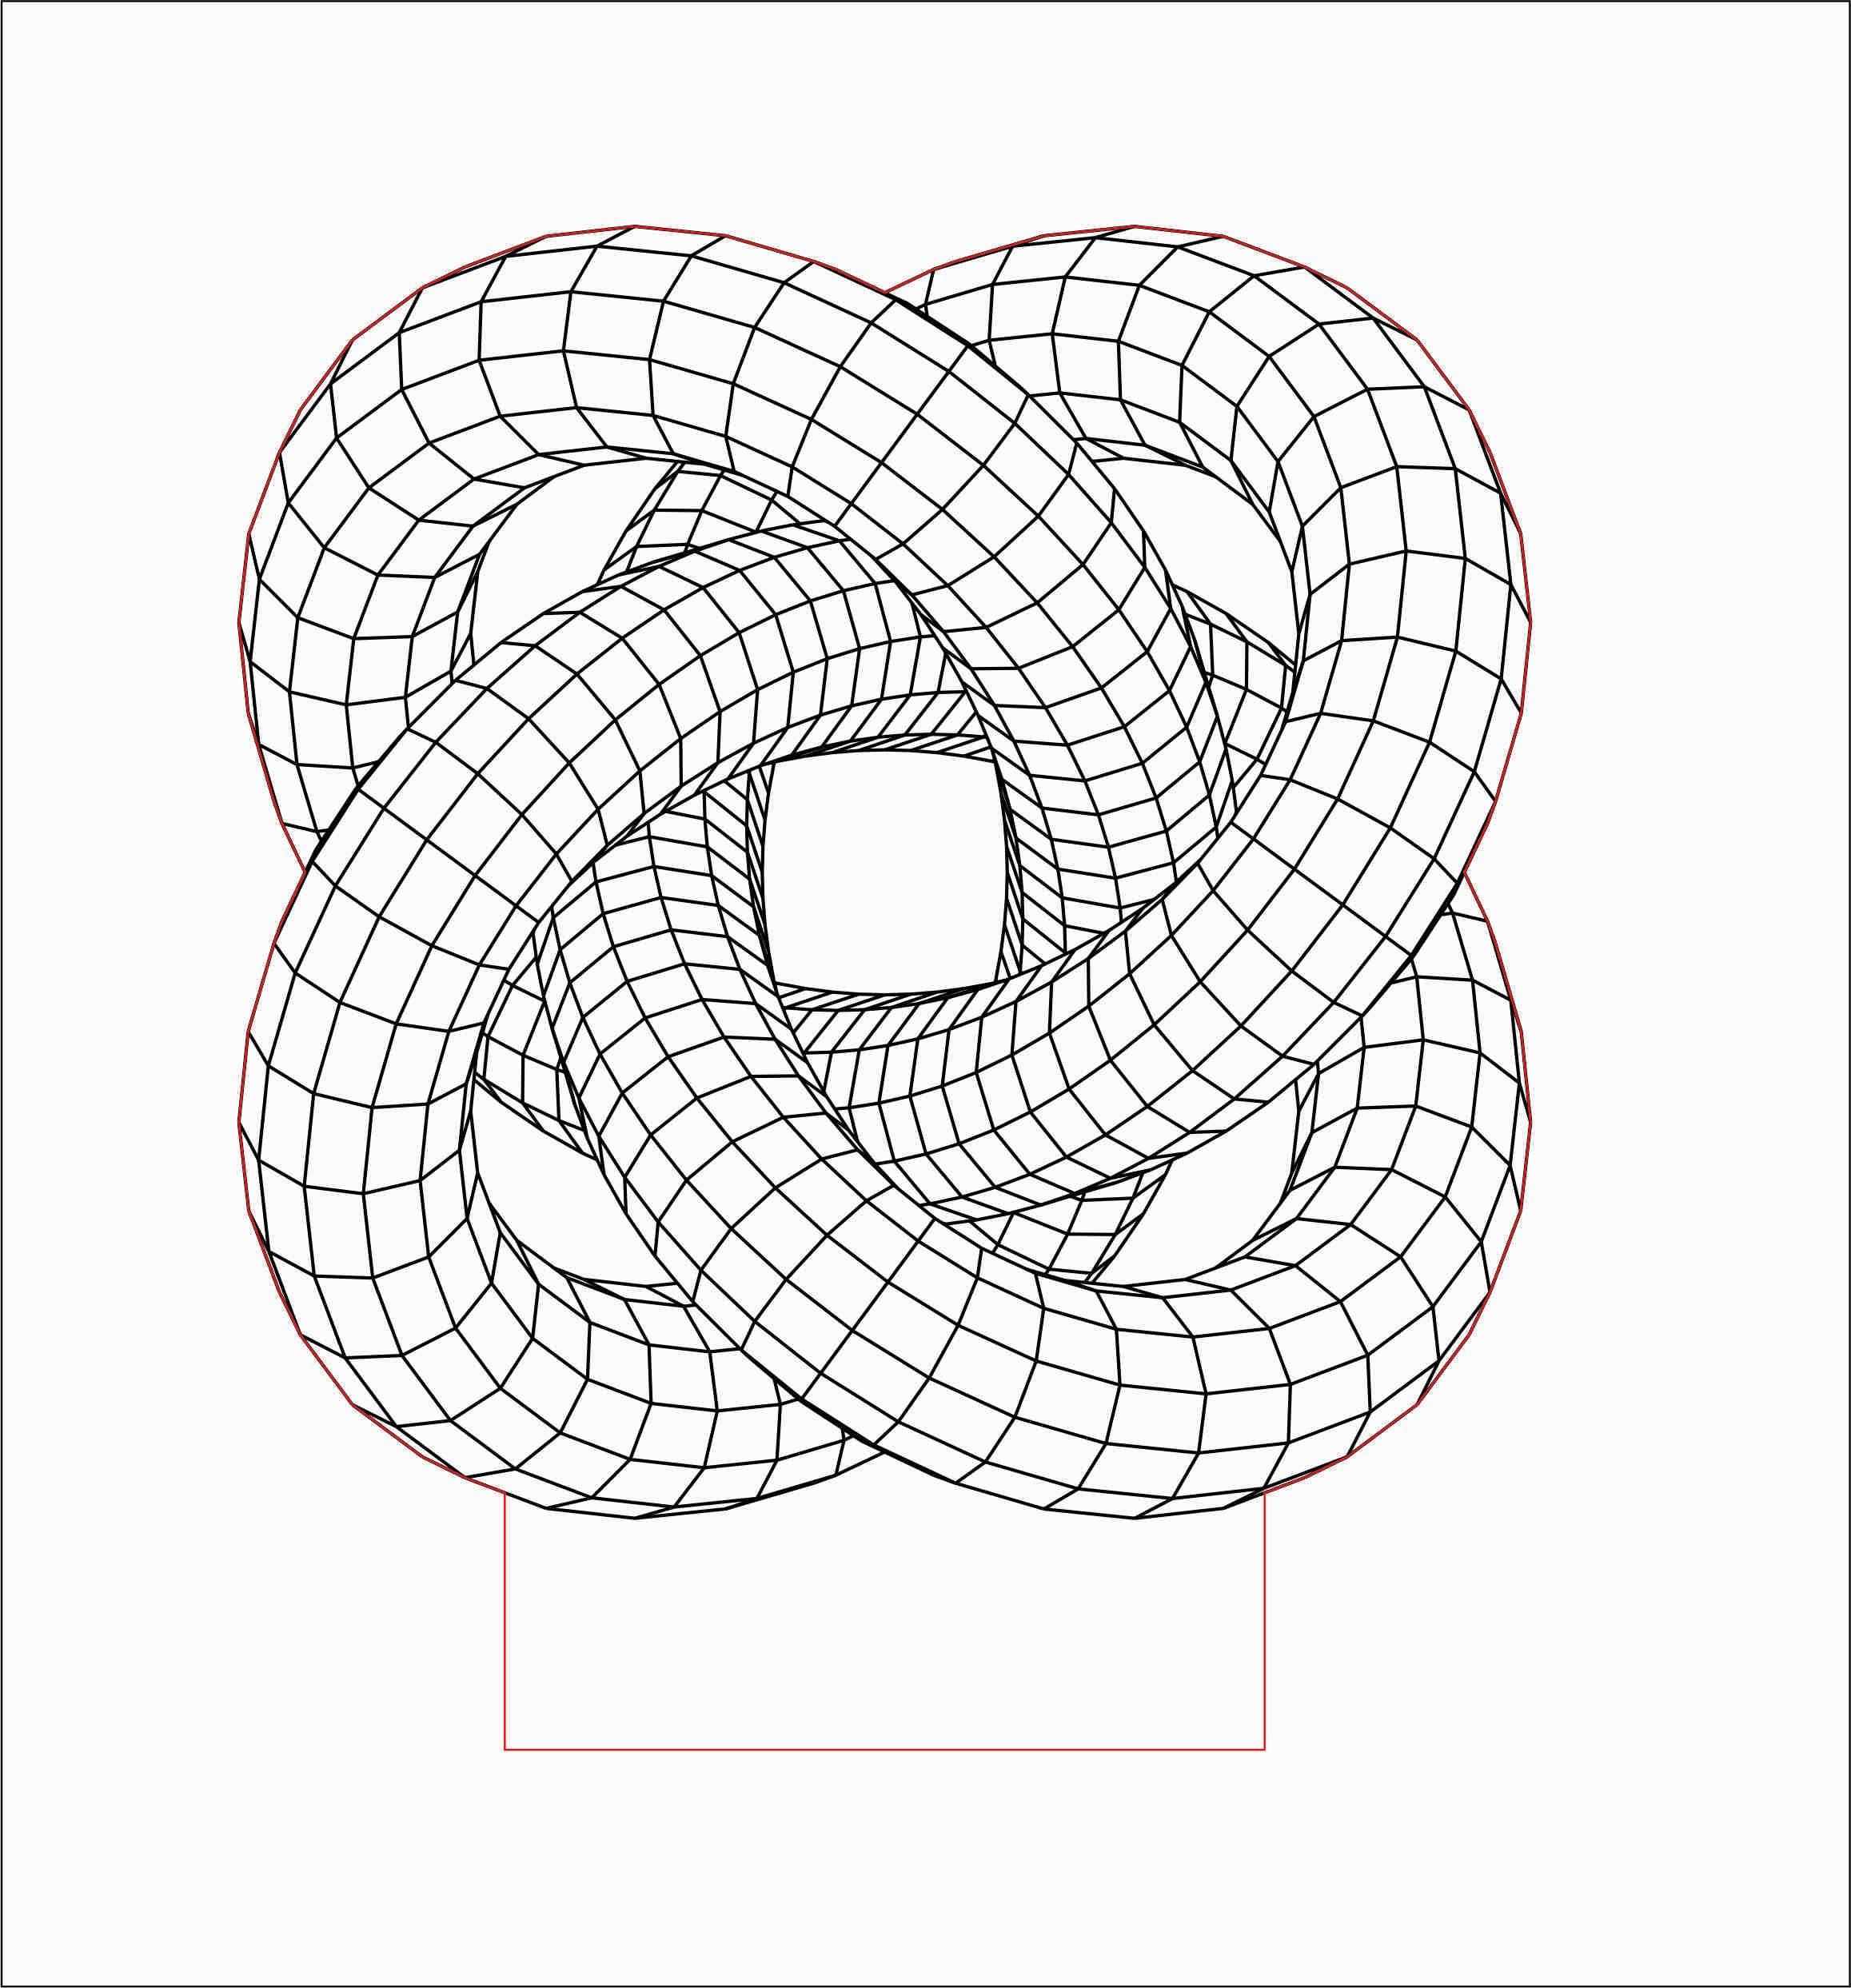 Pin By Defled Iluminacion On 3d Illusion Optical Illusions Art Geometric Art 3d Illusions